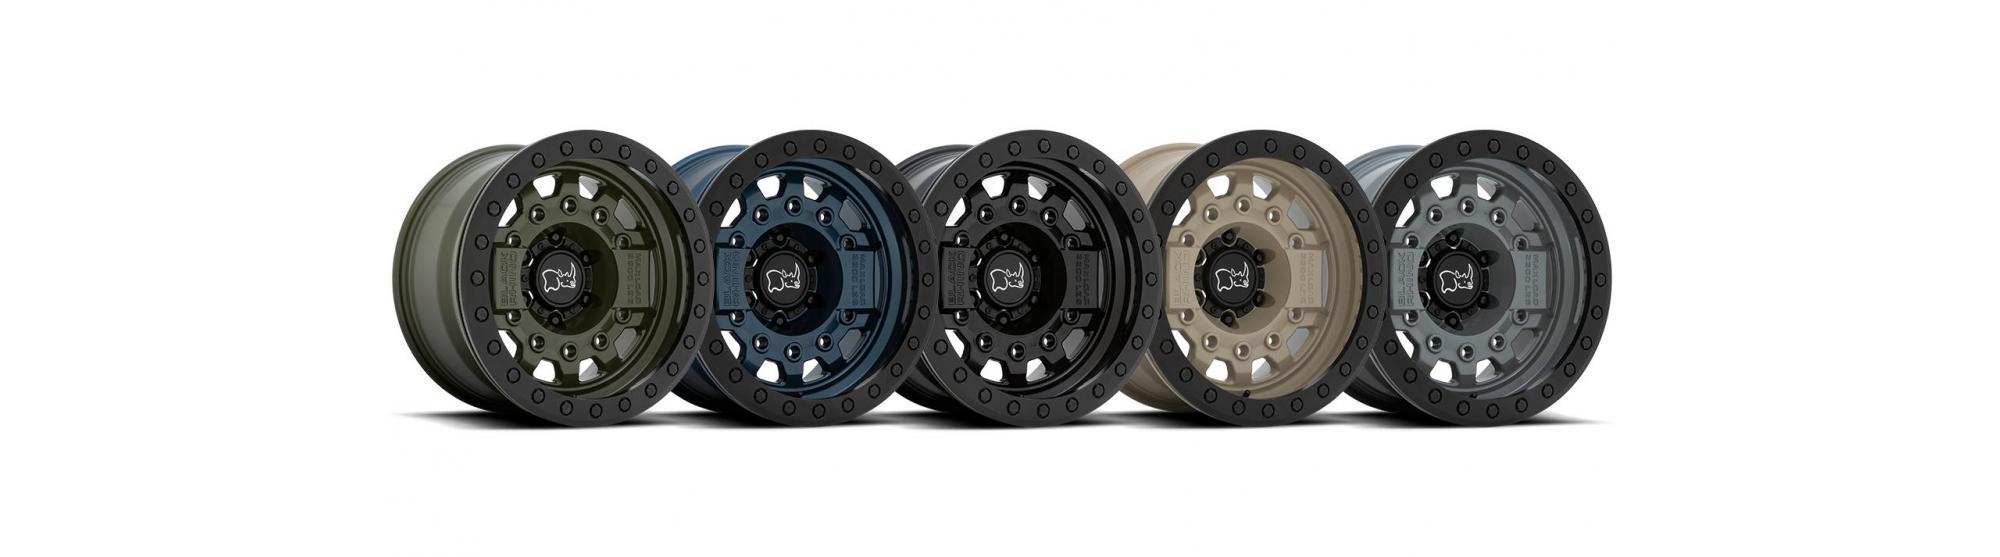 Introducing the Avenger Beadlock From Black Rhino Wheels